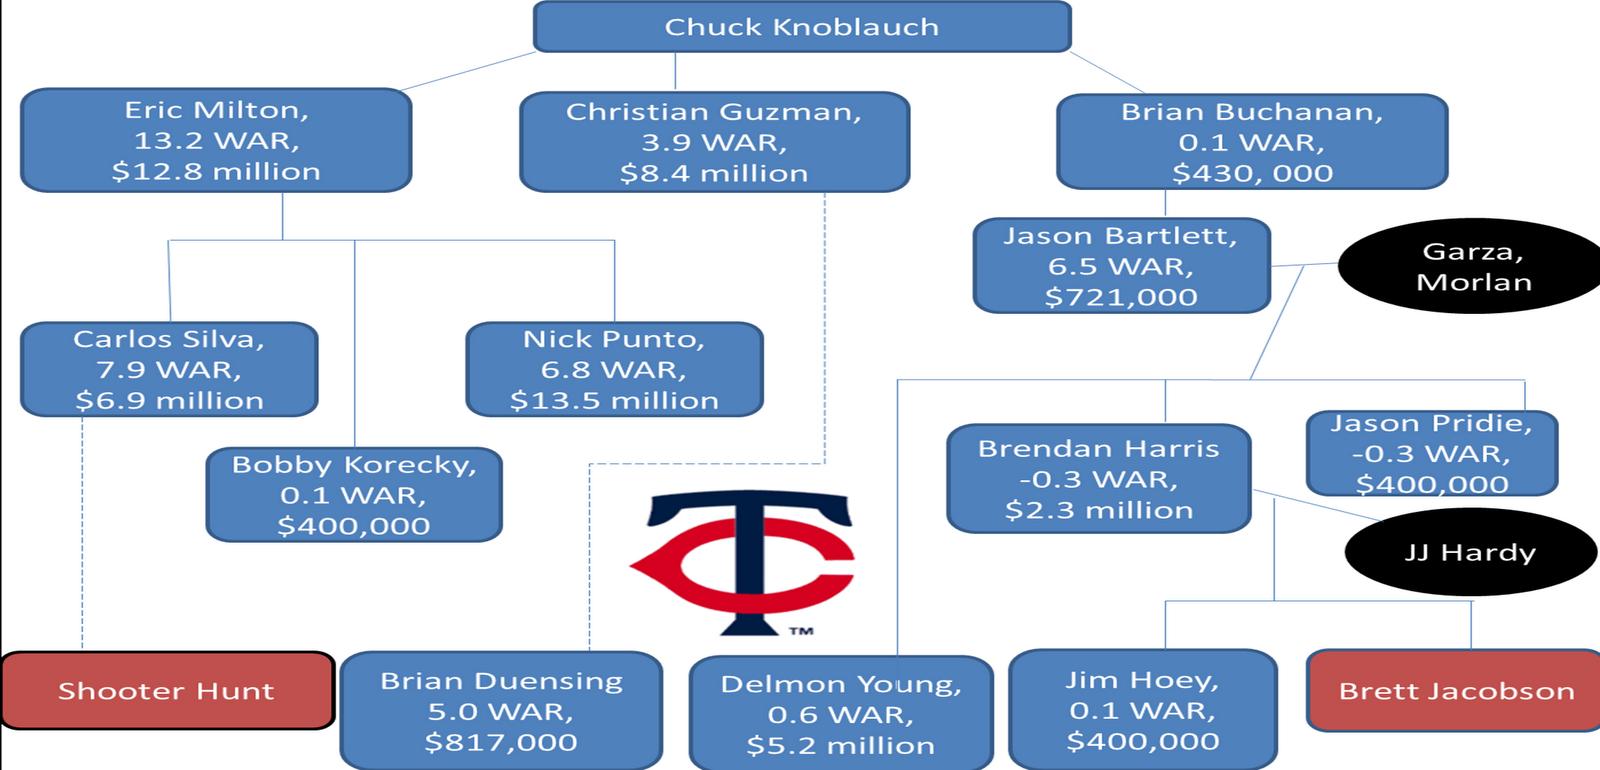 knoblauchfamilytree1.png